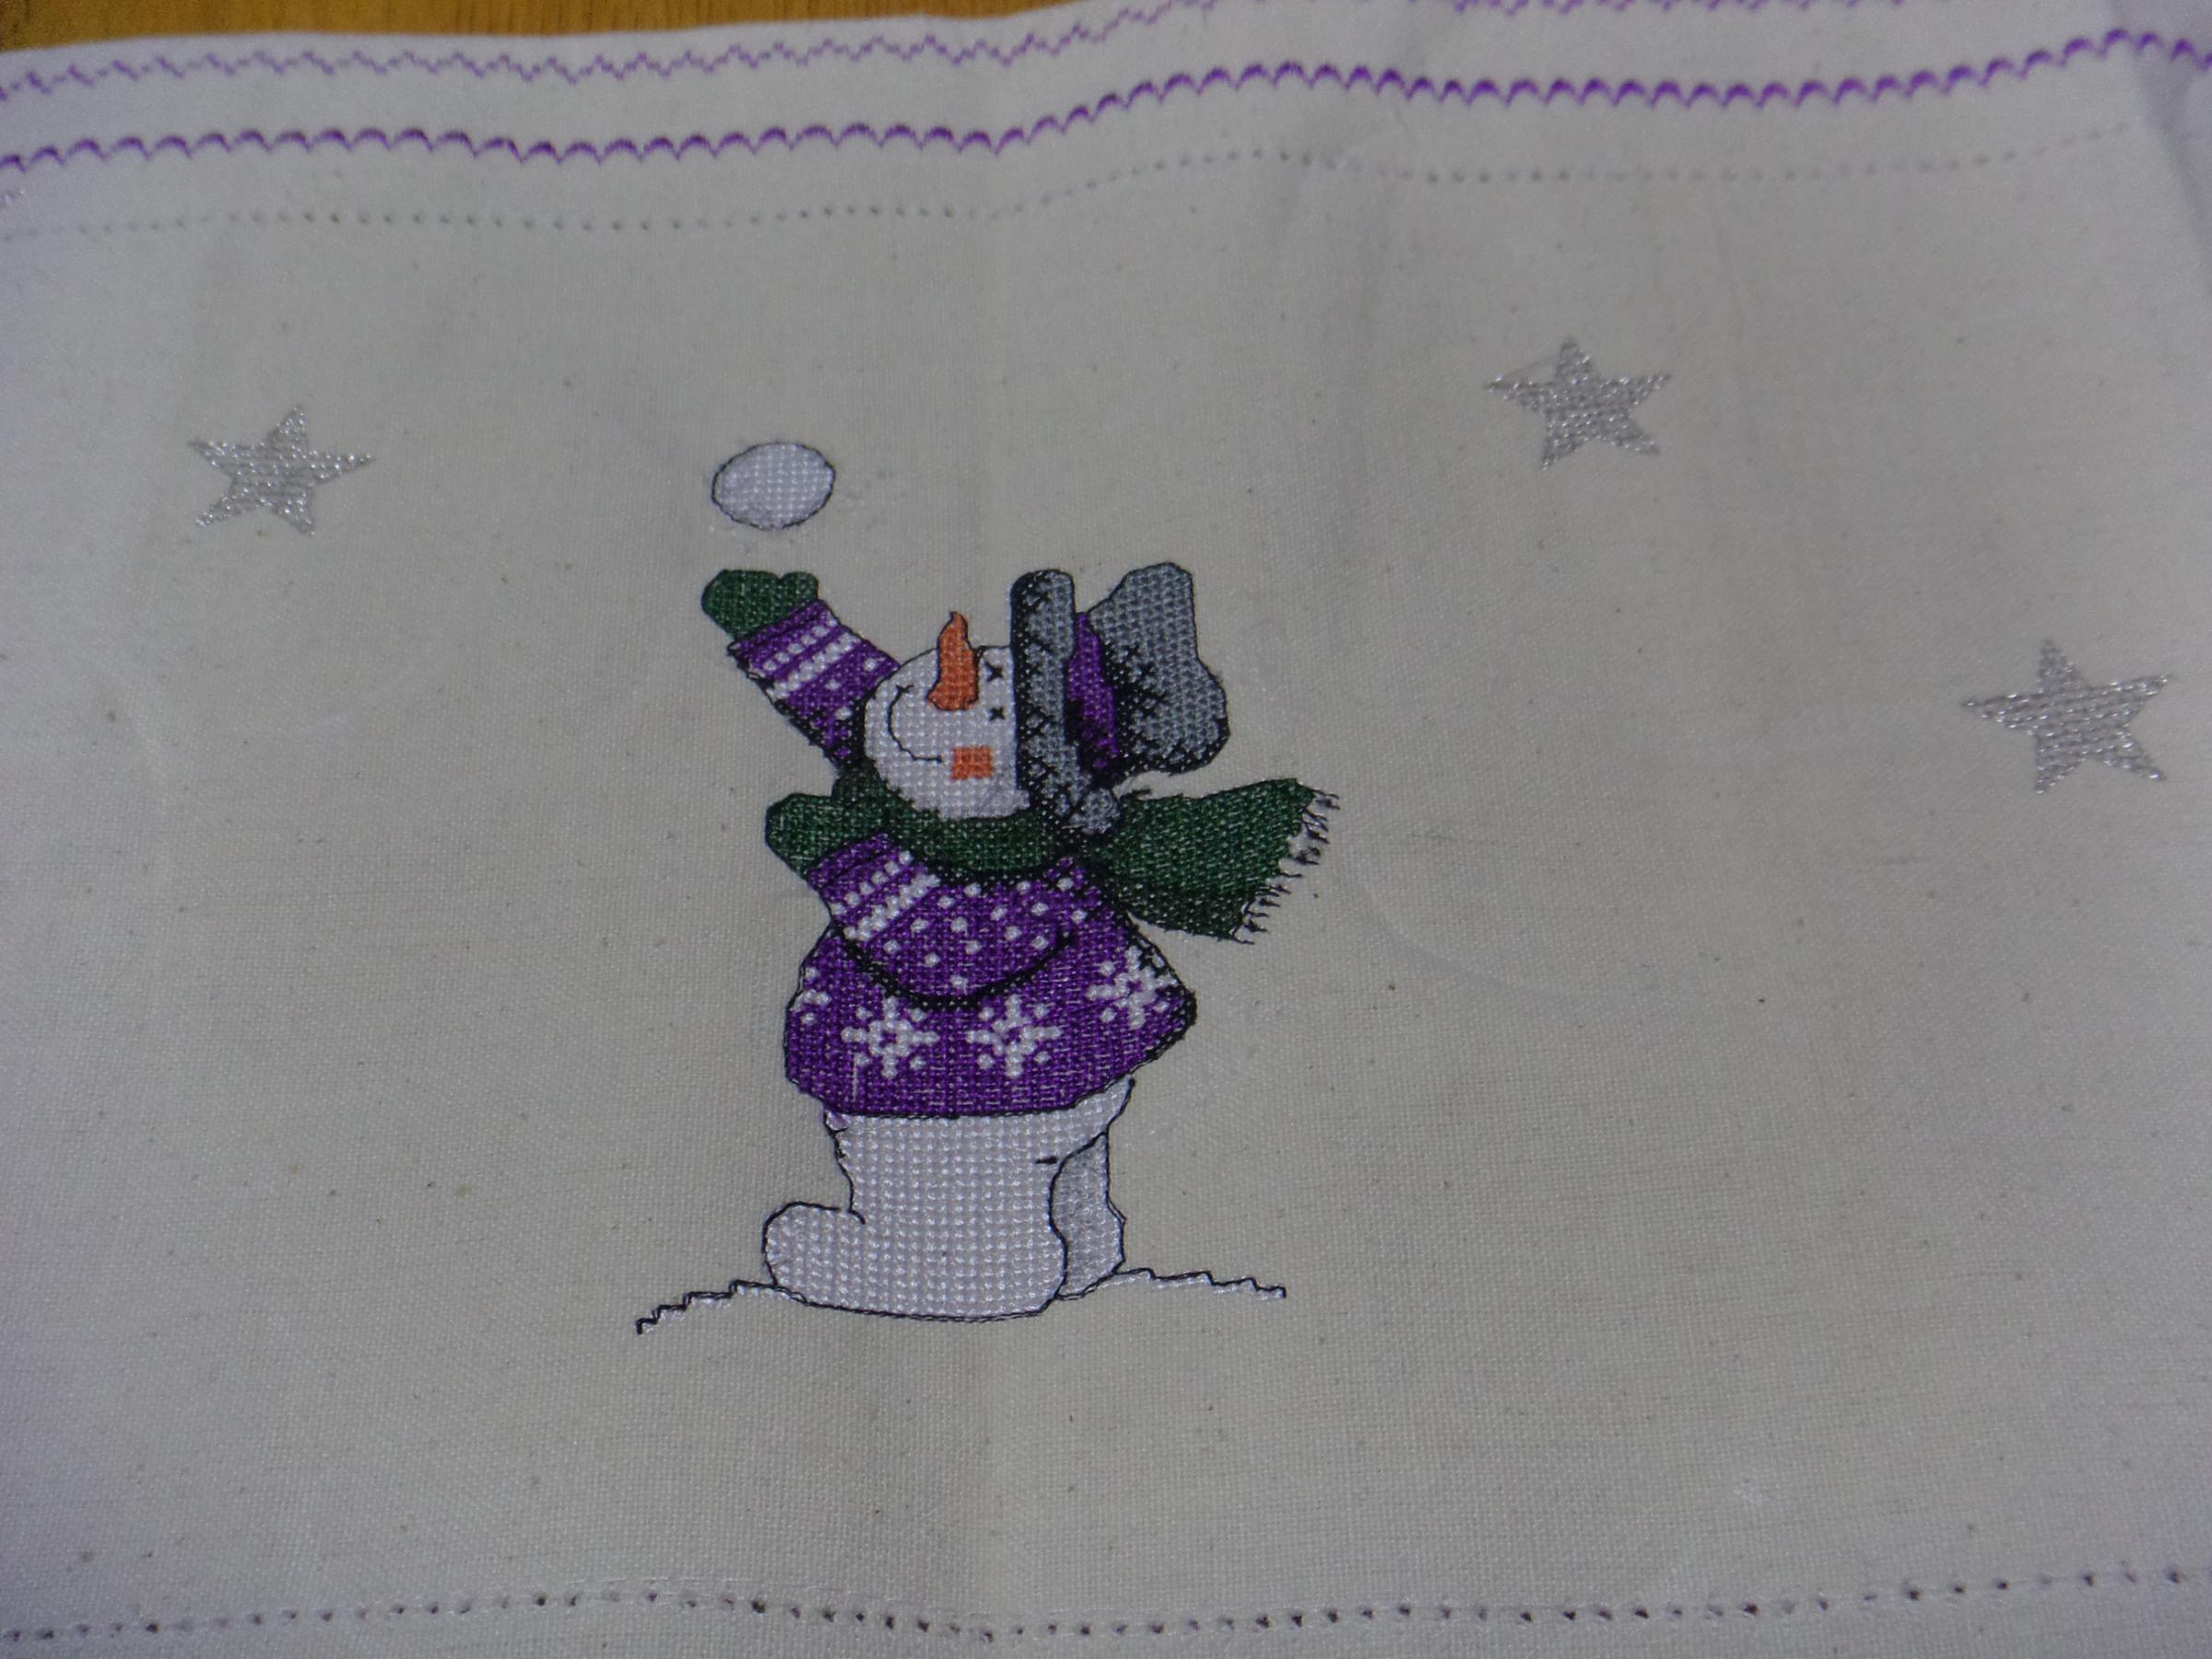 Snowman snowgame cross stitch free embroidery design